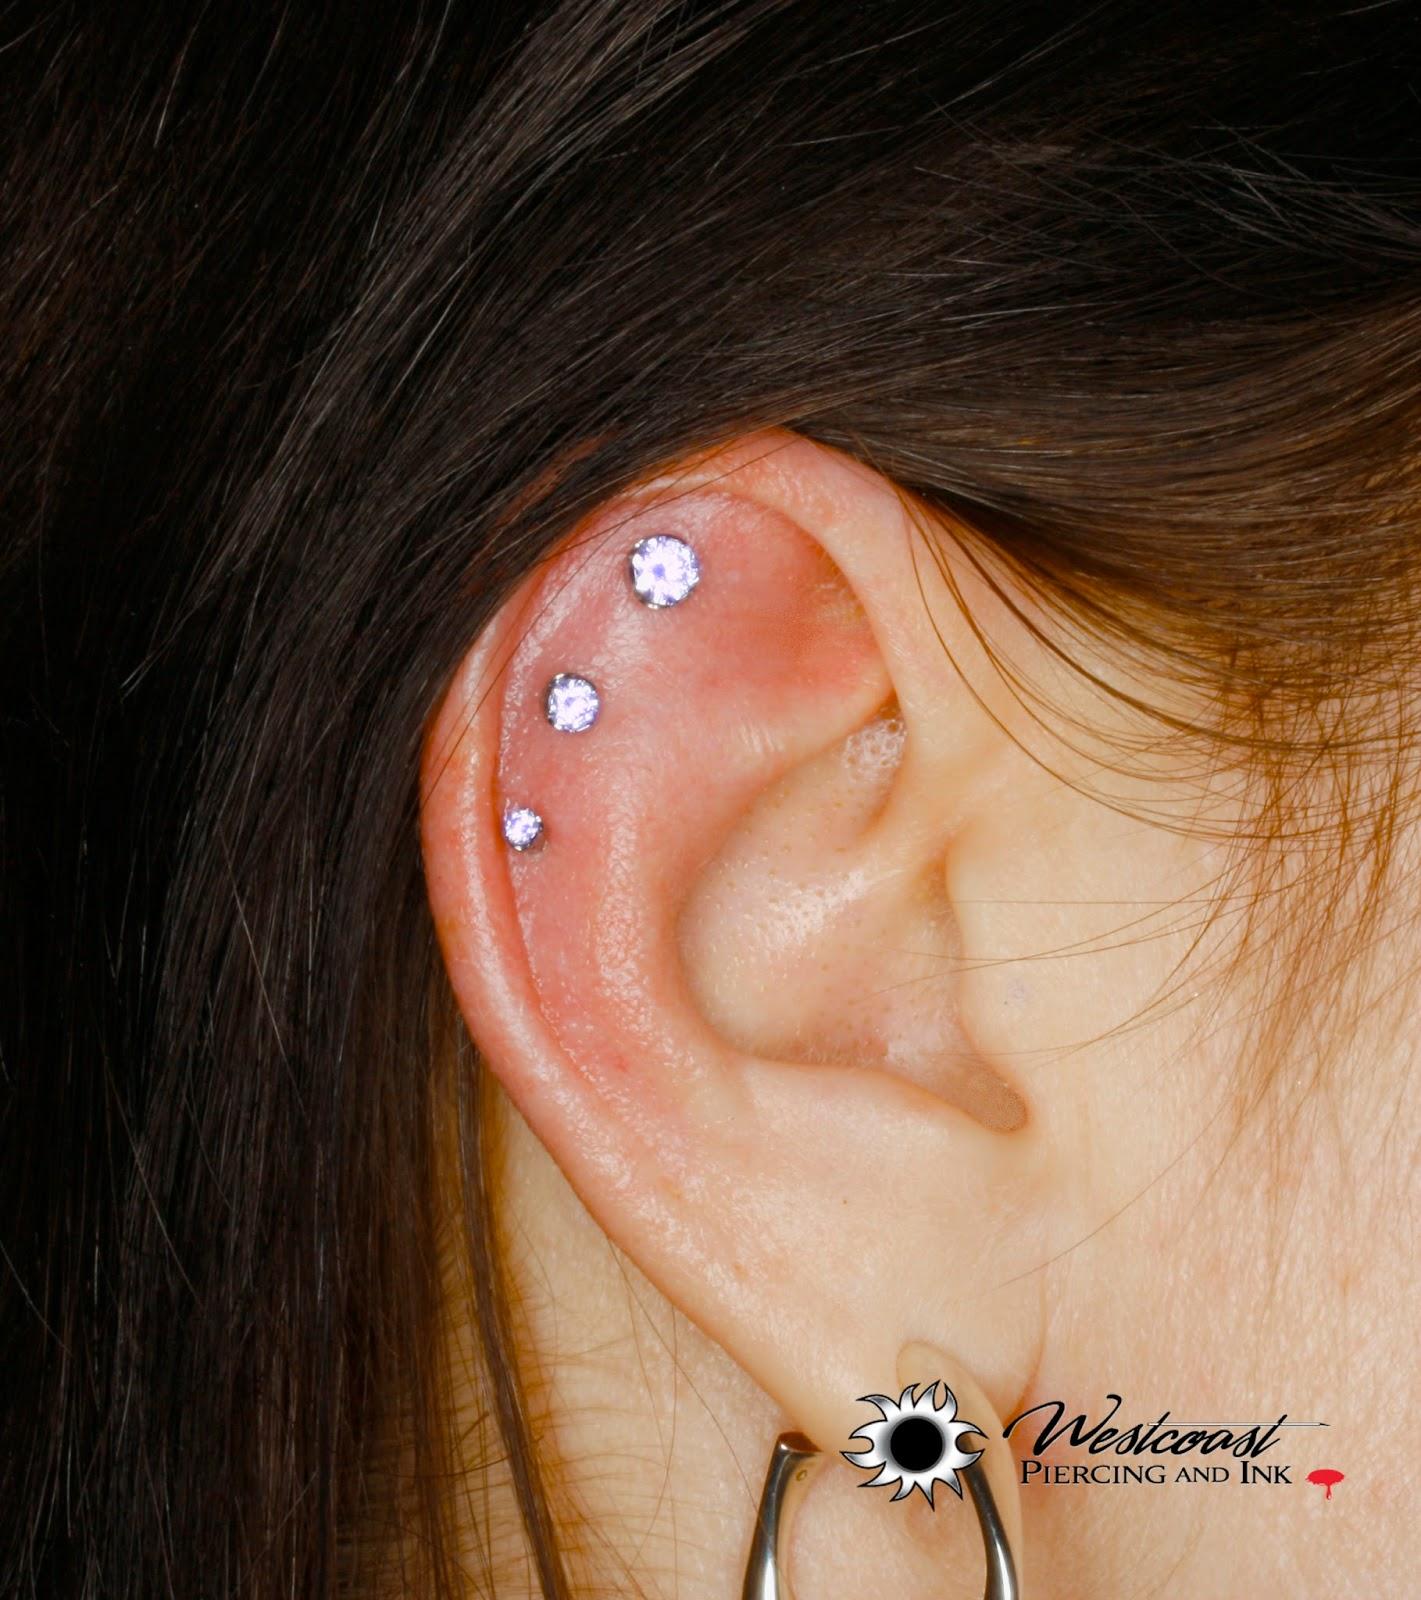 Westcoast Piercing And Ink: Stunning Triple Outer Helix ... Ear Piercings Triple Helix